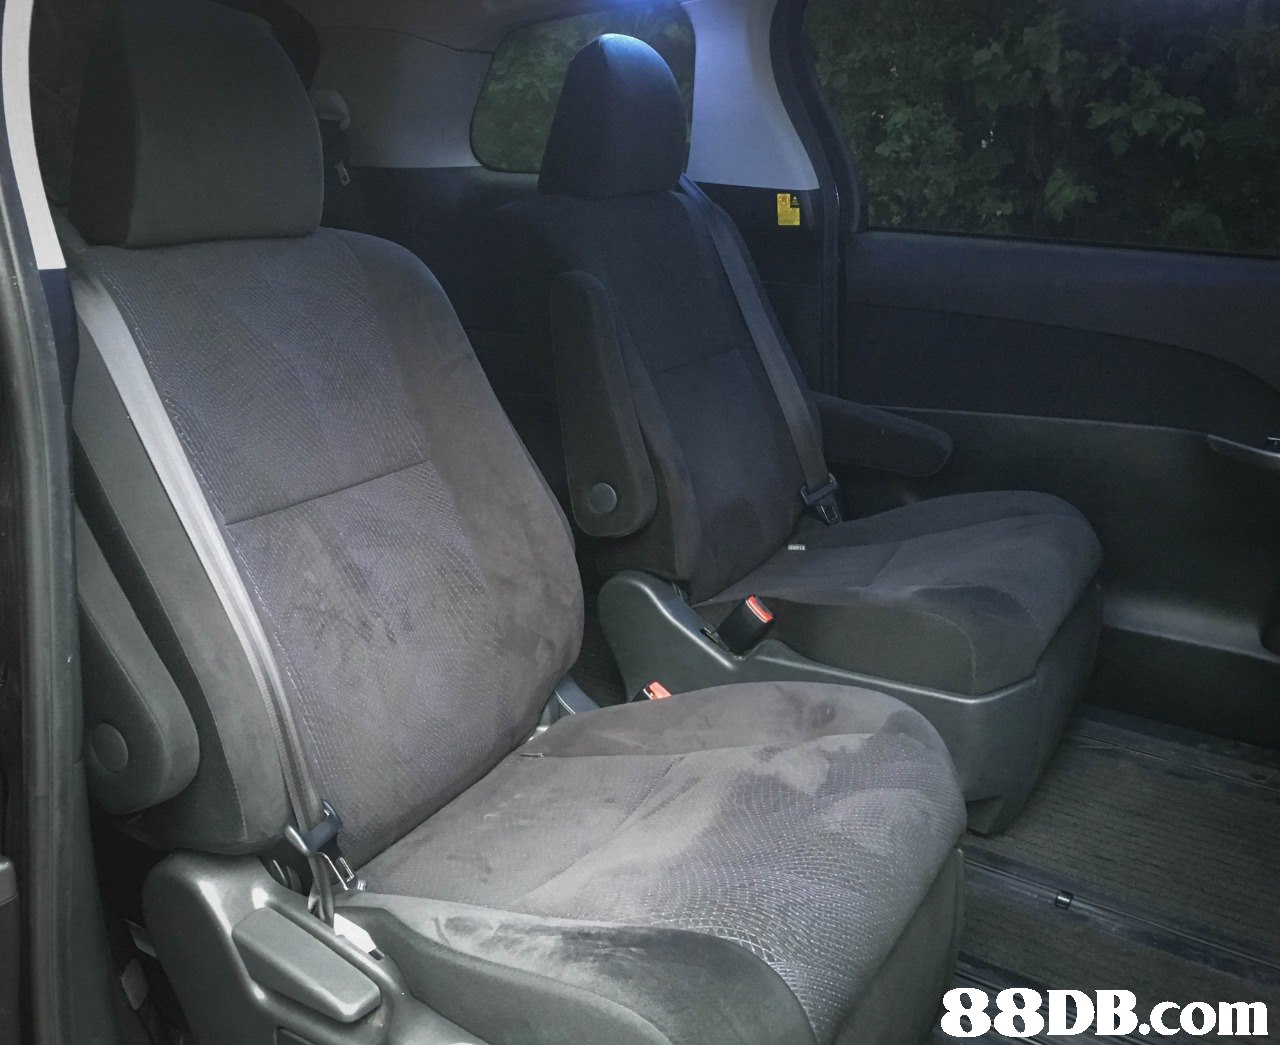 Land vehicle,Vehicle,Car,Car seat cover,Car seat